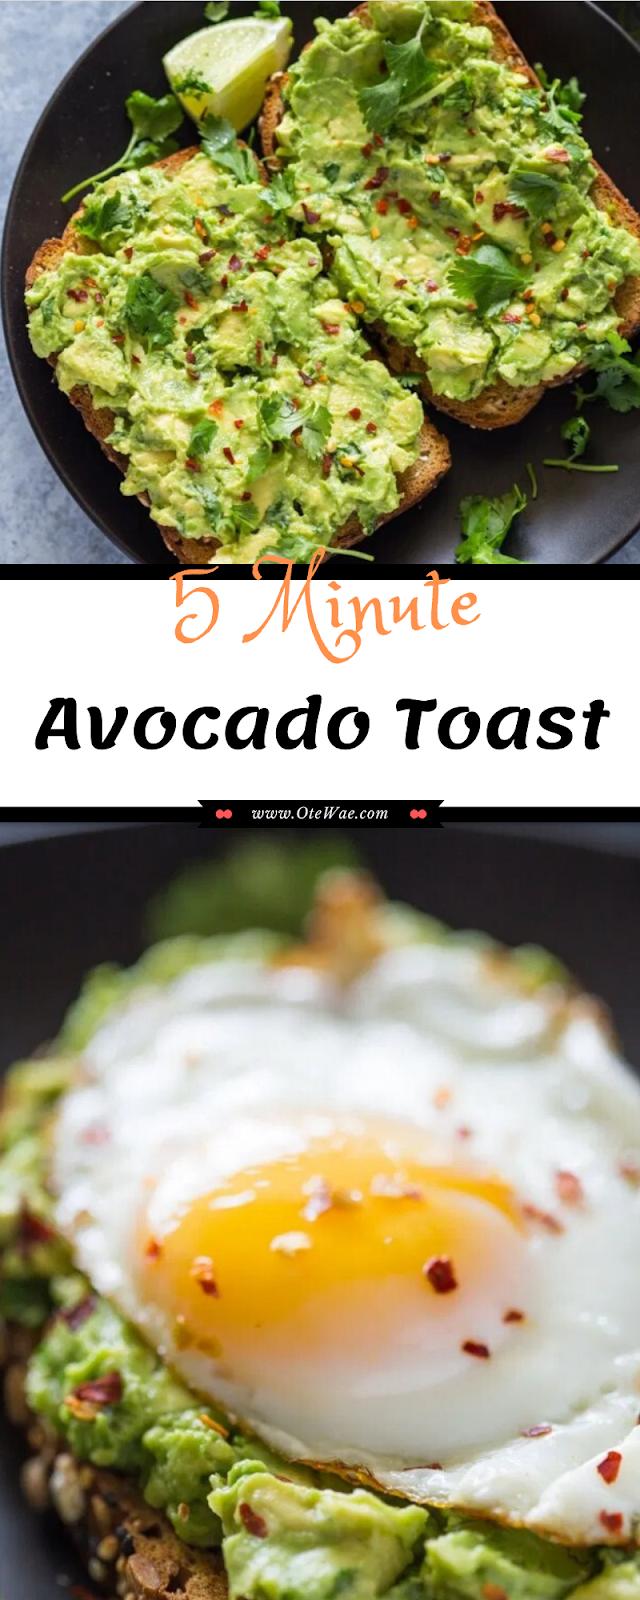 5 Minute Avocado Toast